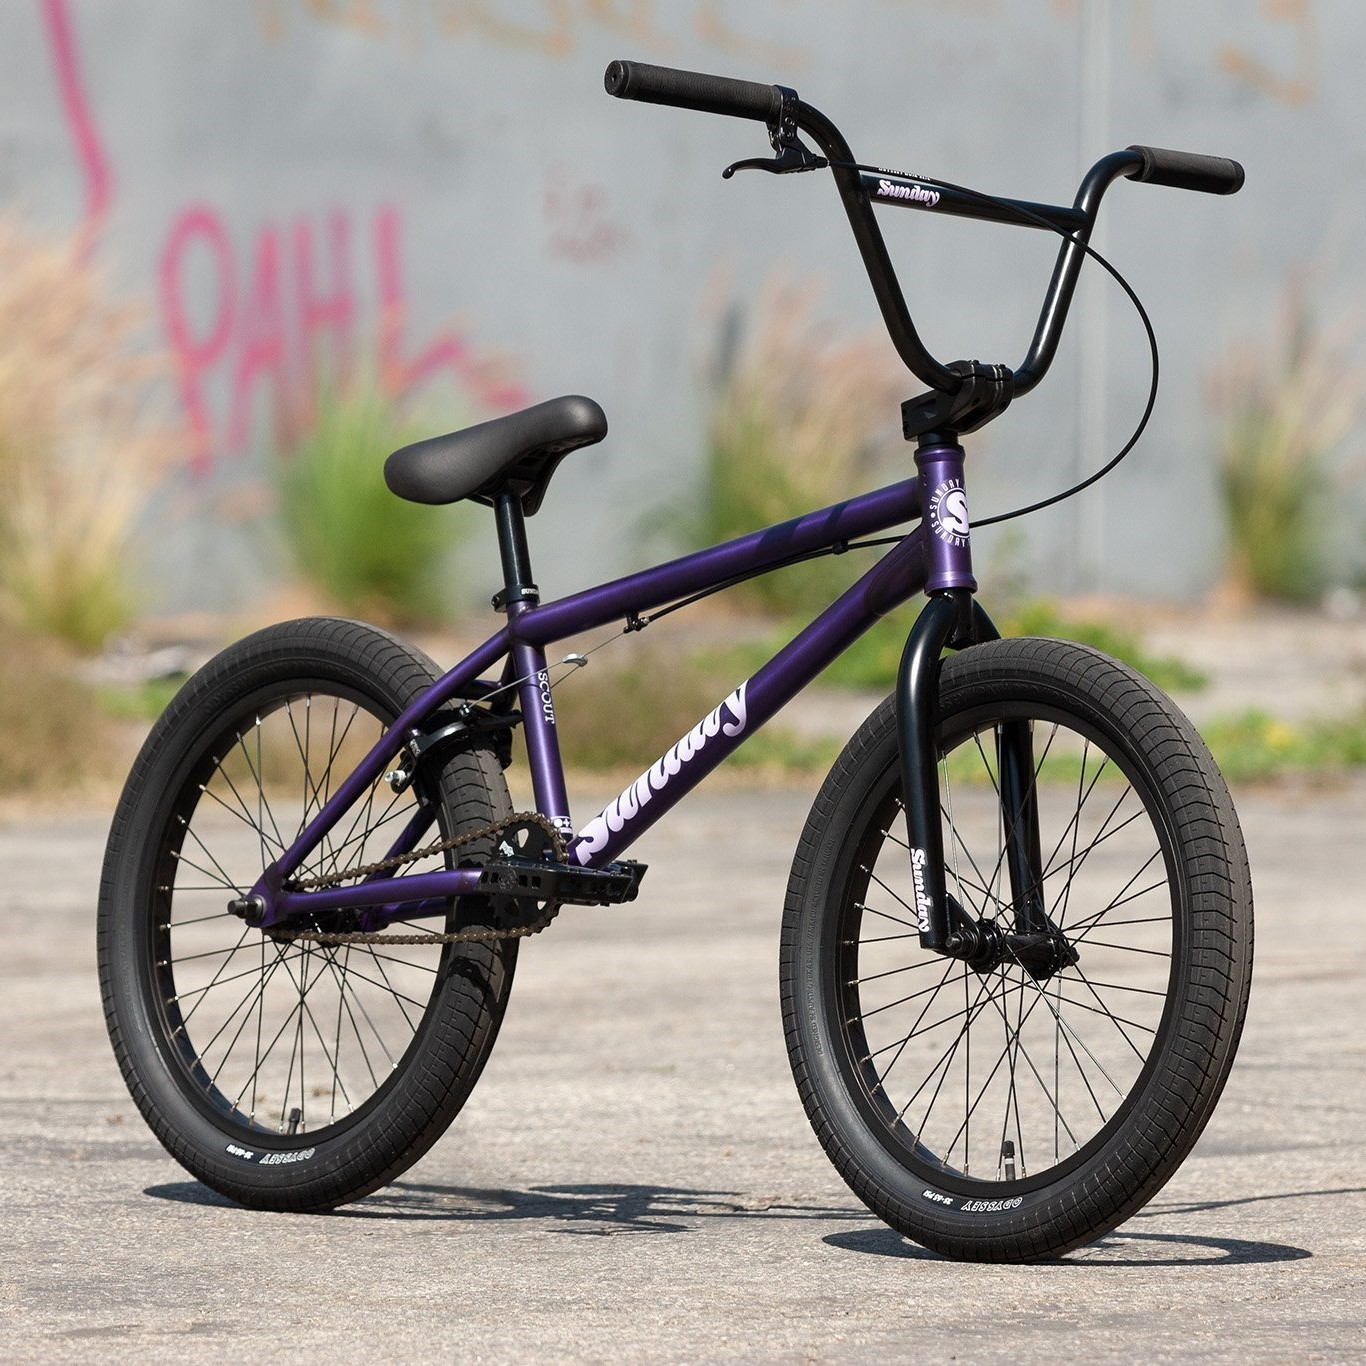 "SUNDAY Bicicleta BMX 2022 Scout mov mat translucent 20.75""TT"